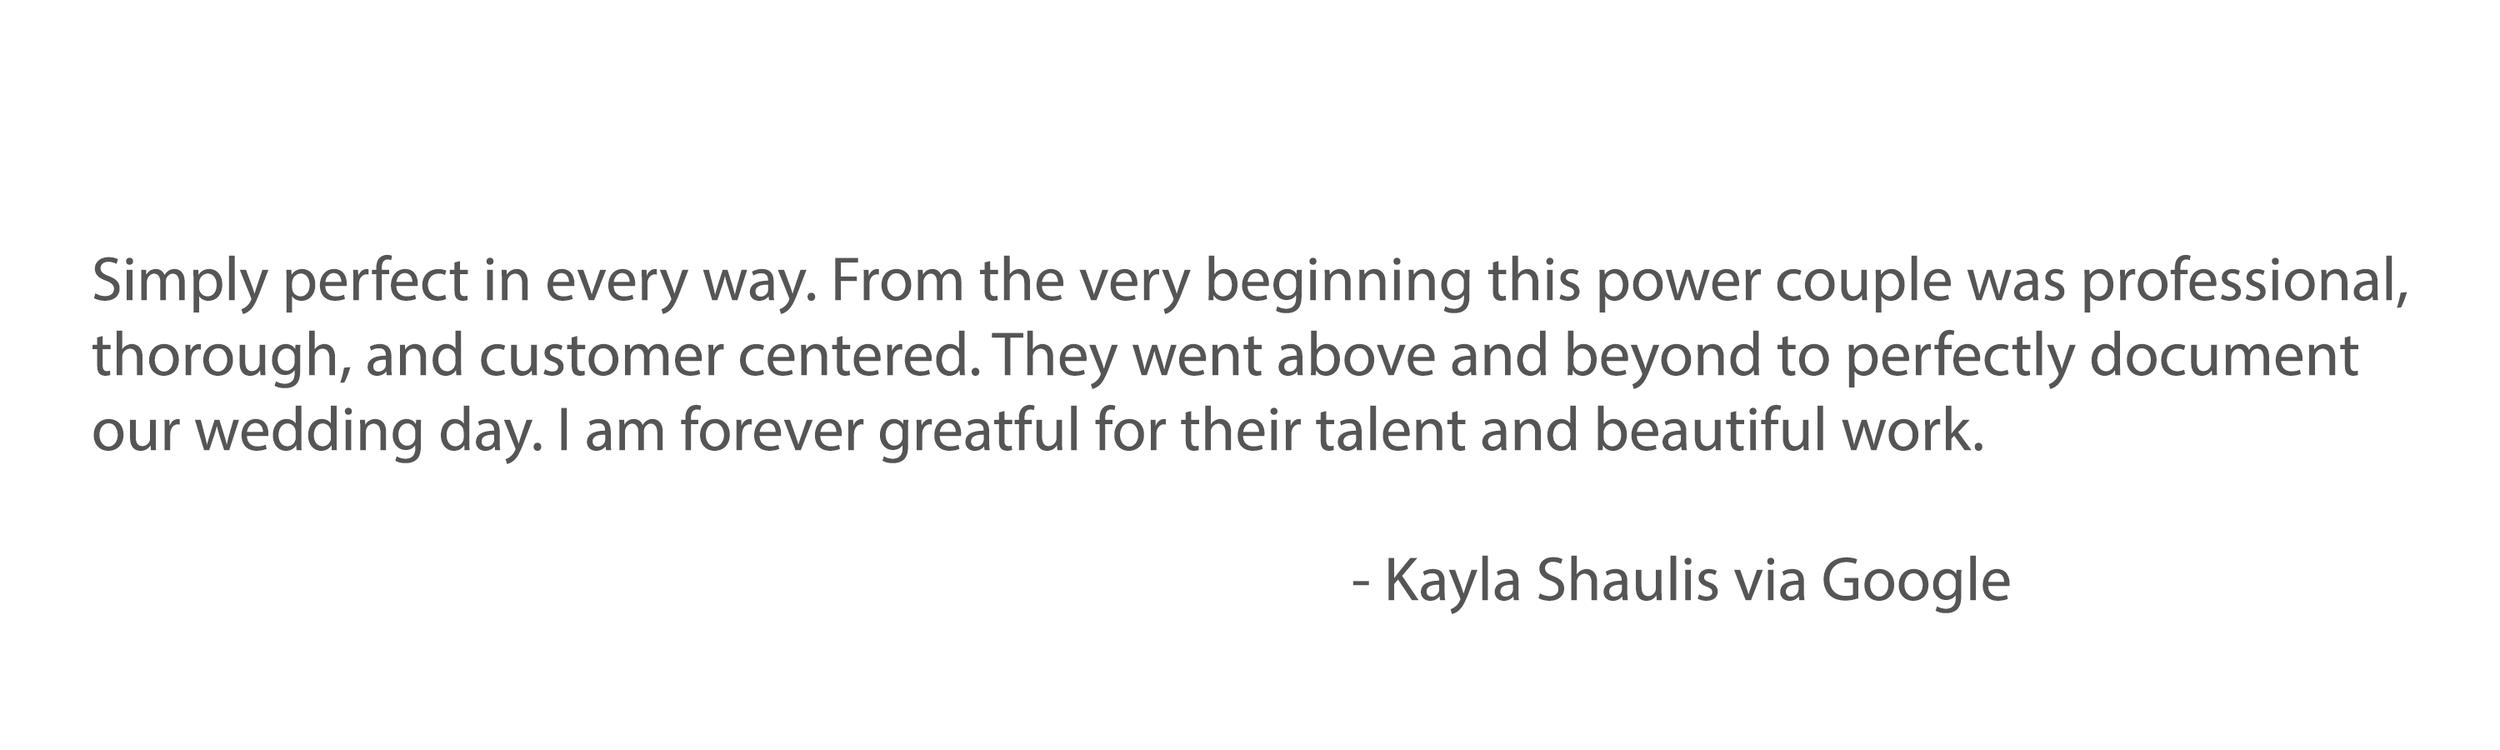 Kayla Review